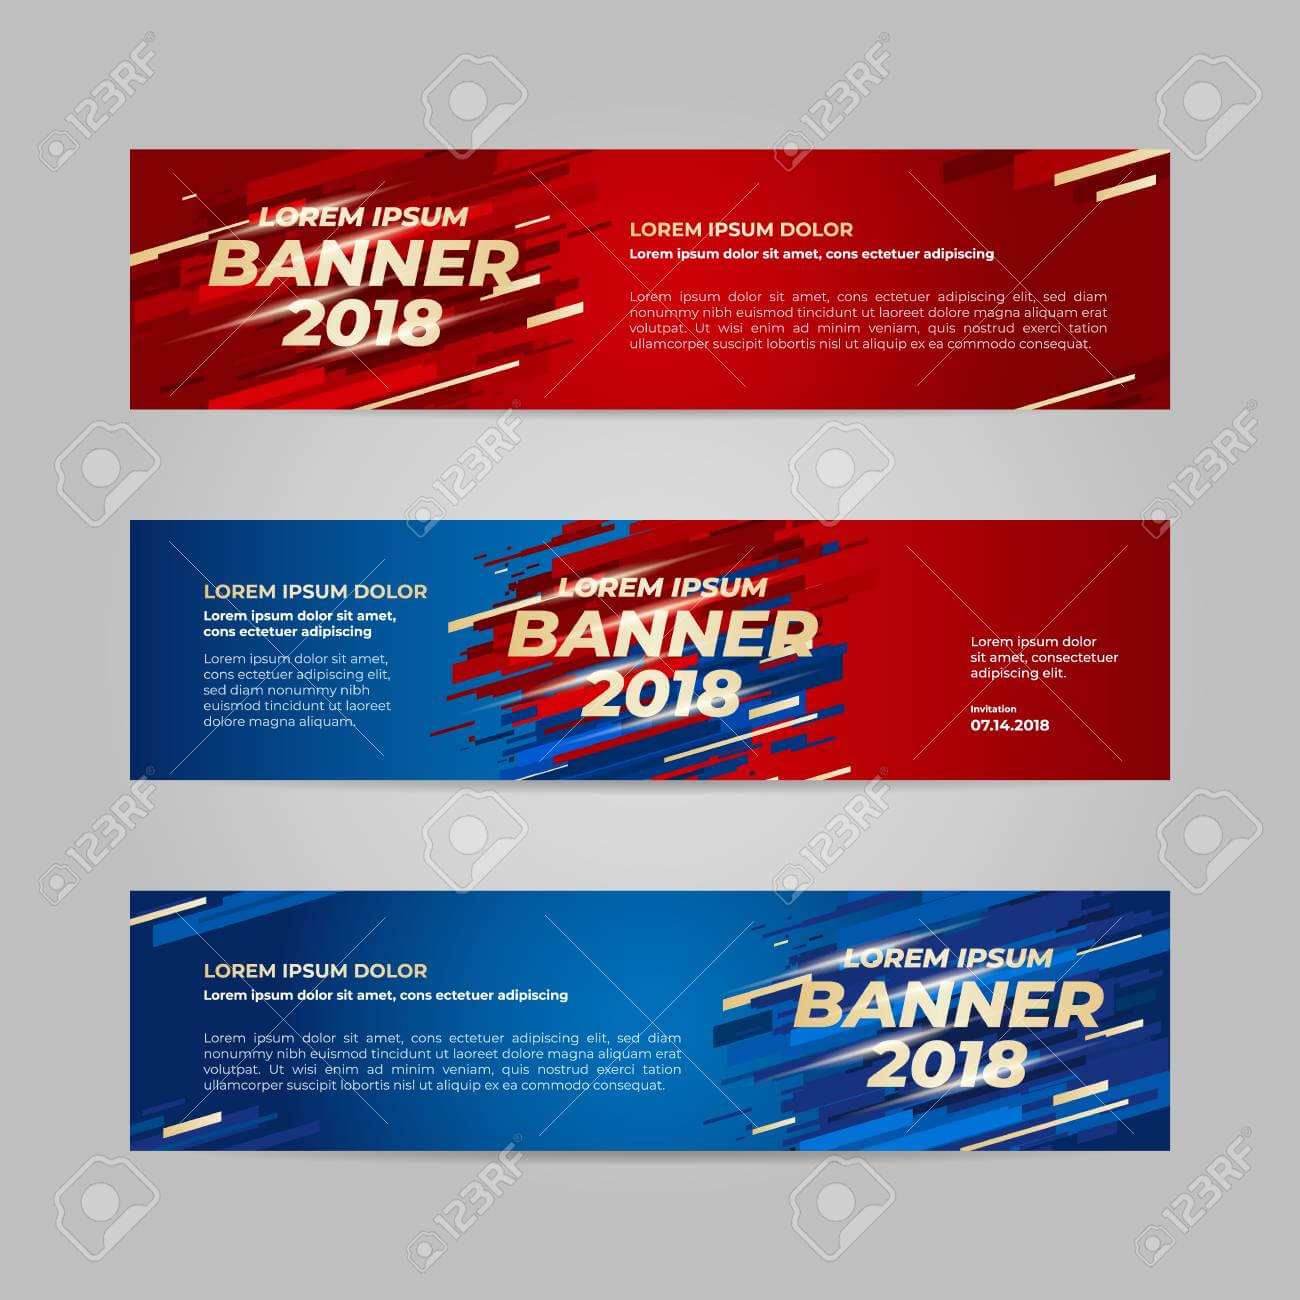 Vector Design Banner Web Template For Sport Event, 2018 Trend For Event Banner Template